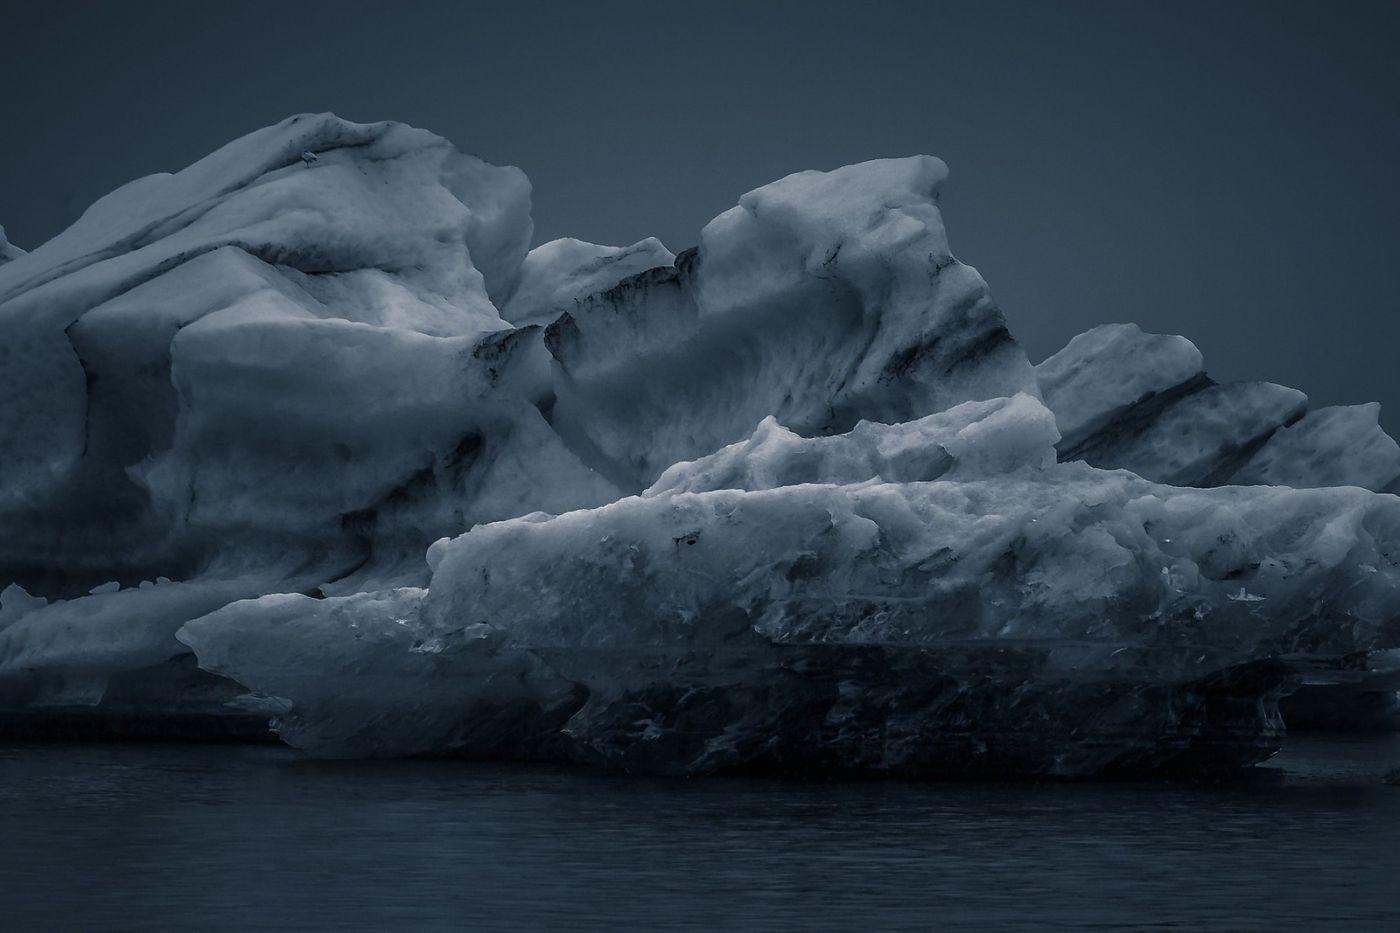 冰岛冰川泻湖(Glacier Lagoon),流动的冰川_图1-29